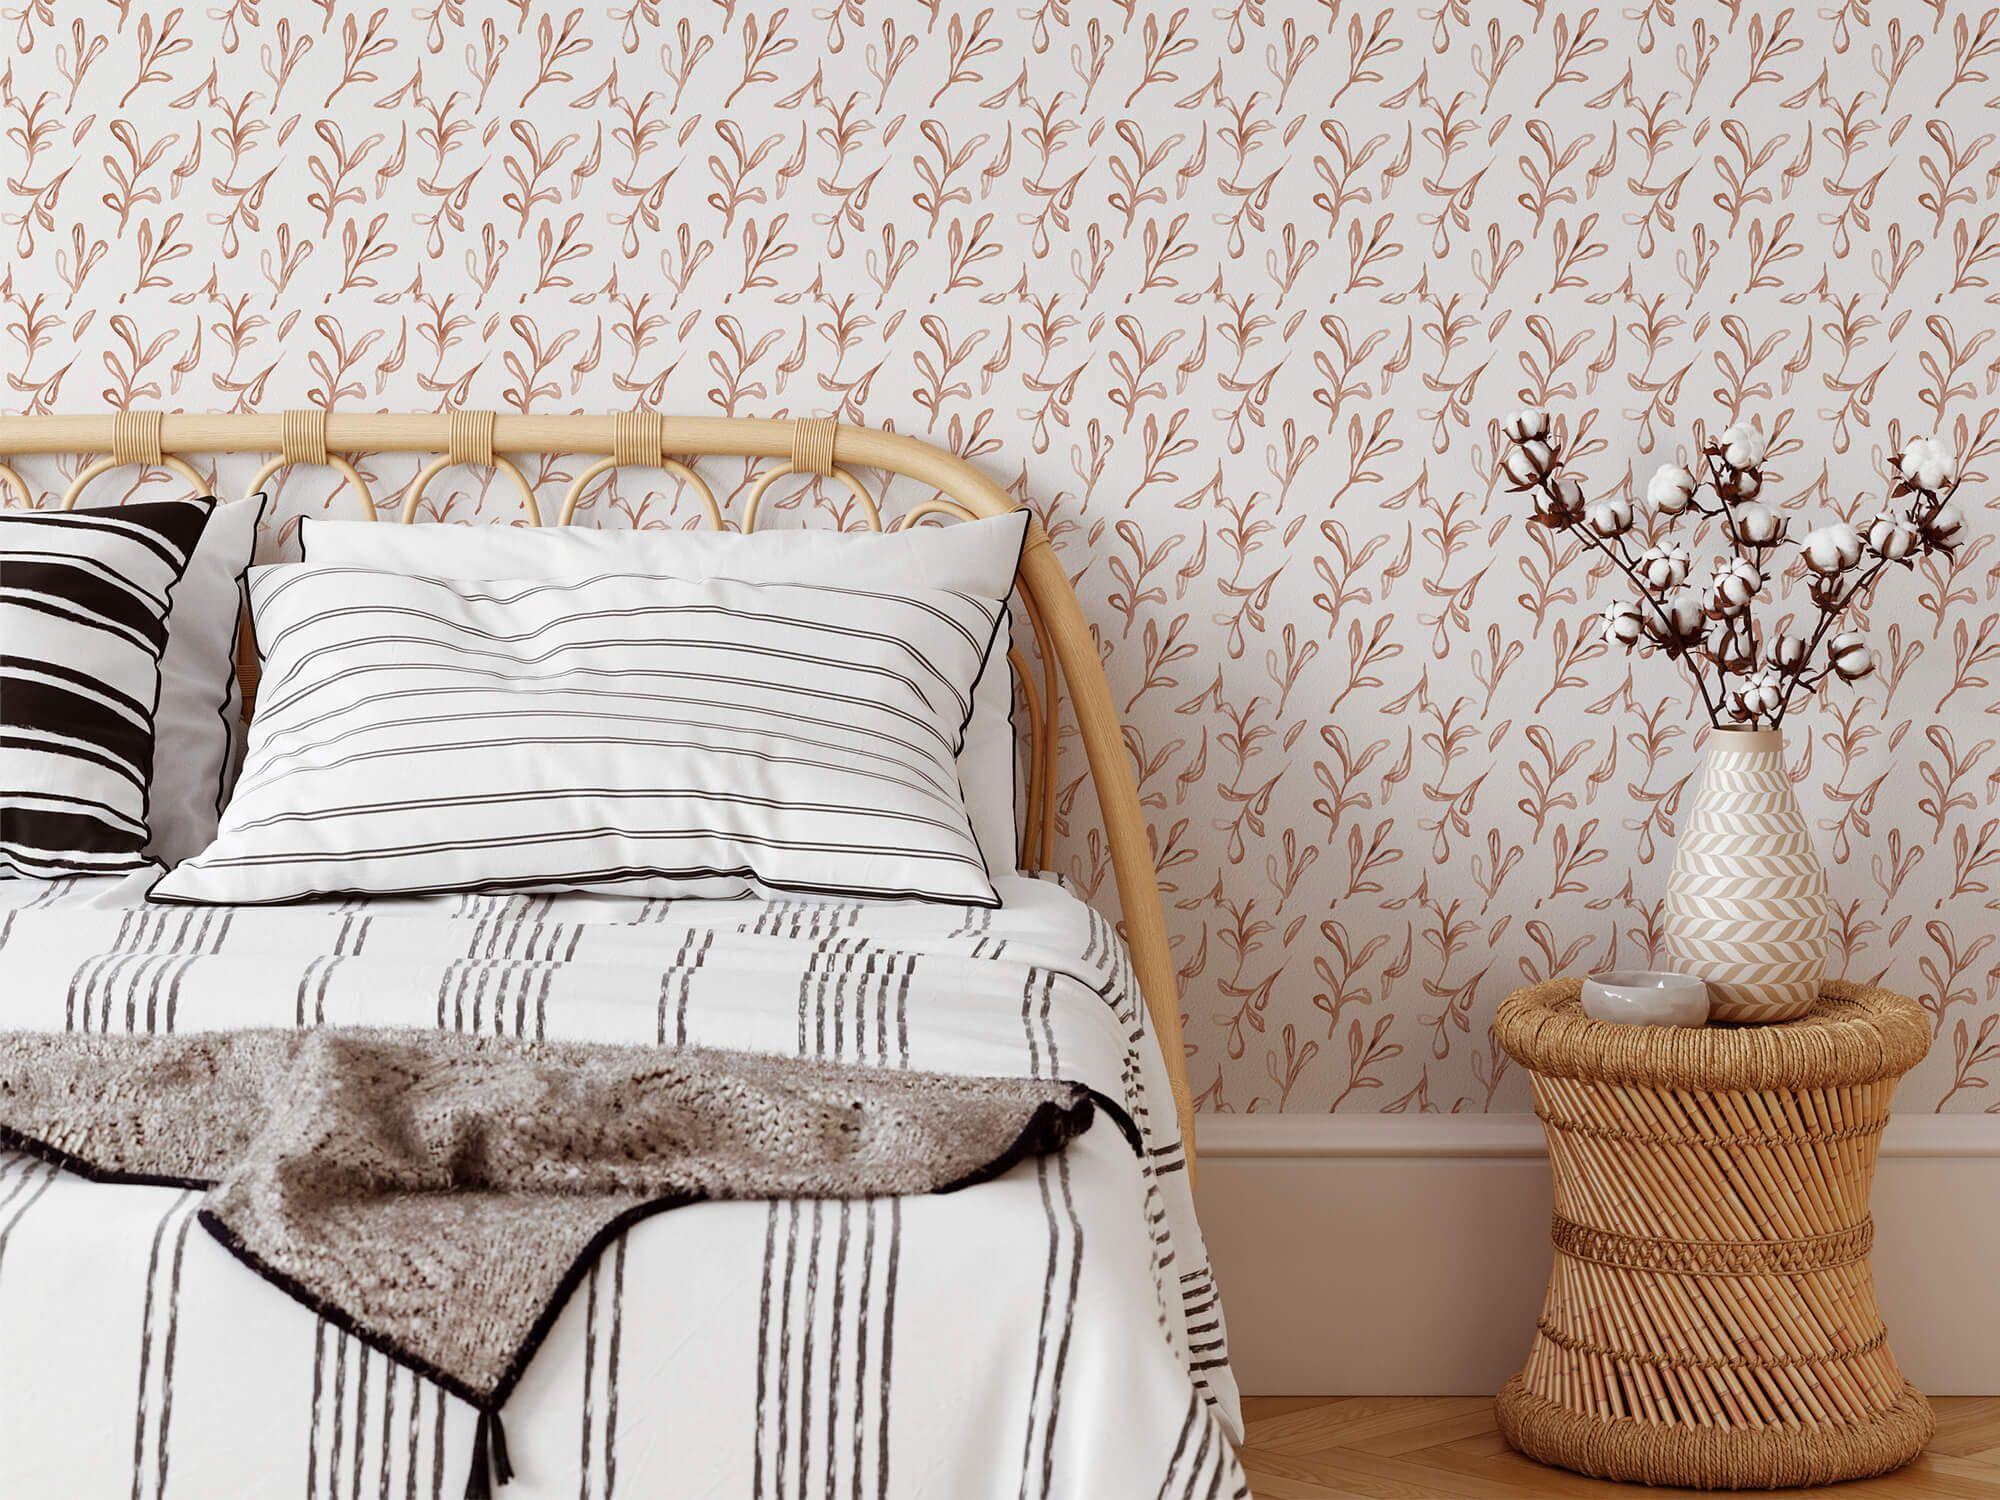 Terracotta Leaf Removable Wallpaper Removable Wallpaper Neutral Wallpaper Home Decor